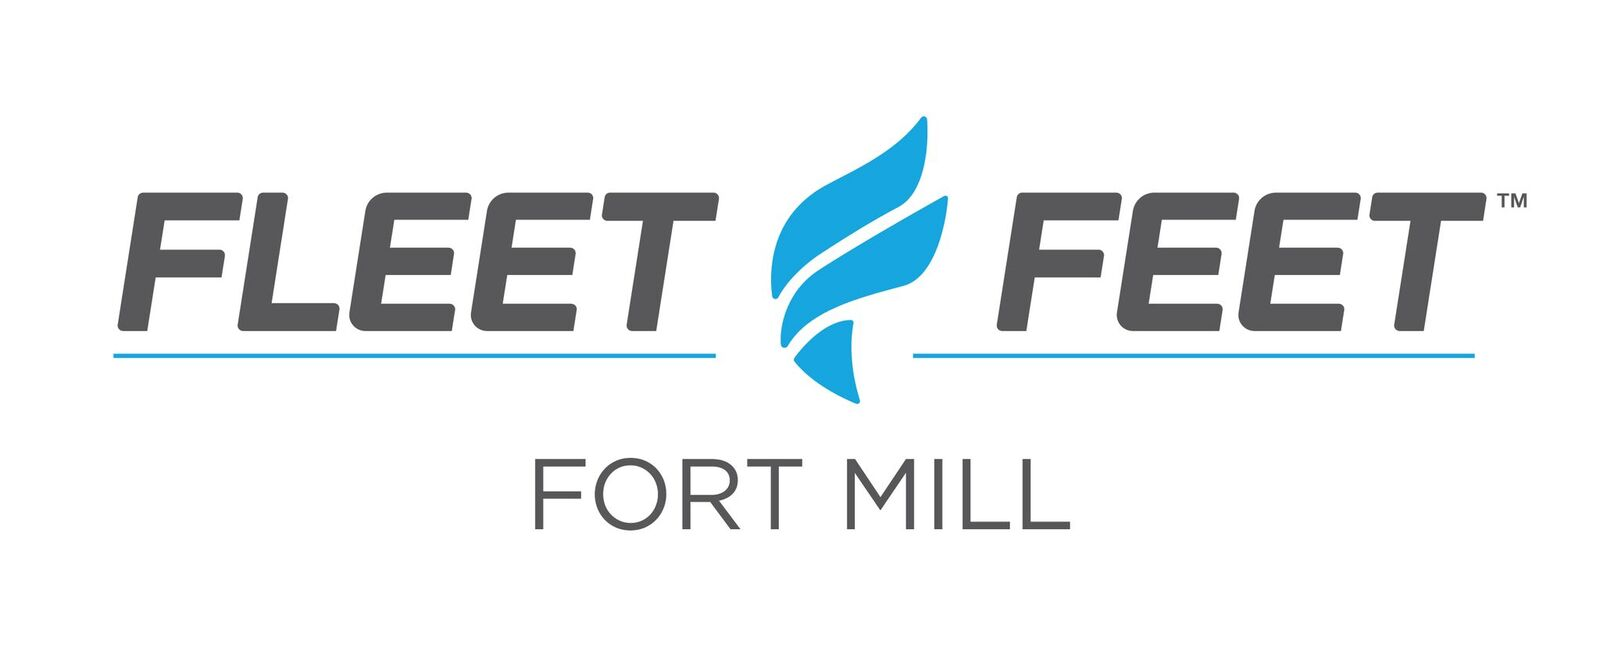 Fleet Feet Fort Mill Logo